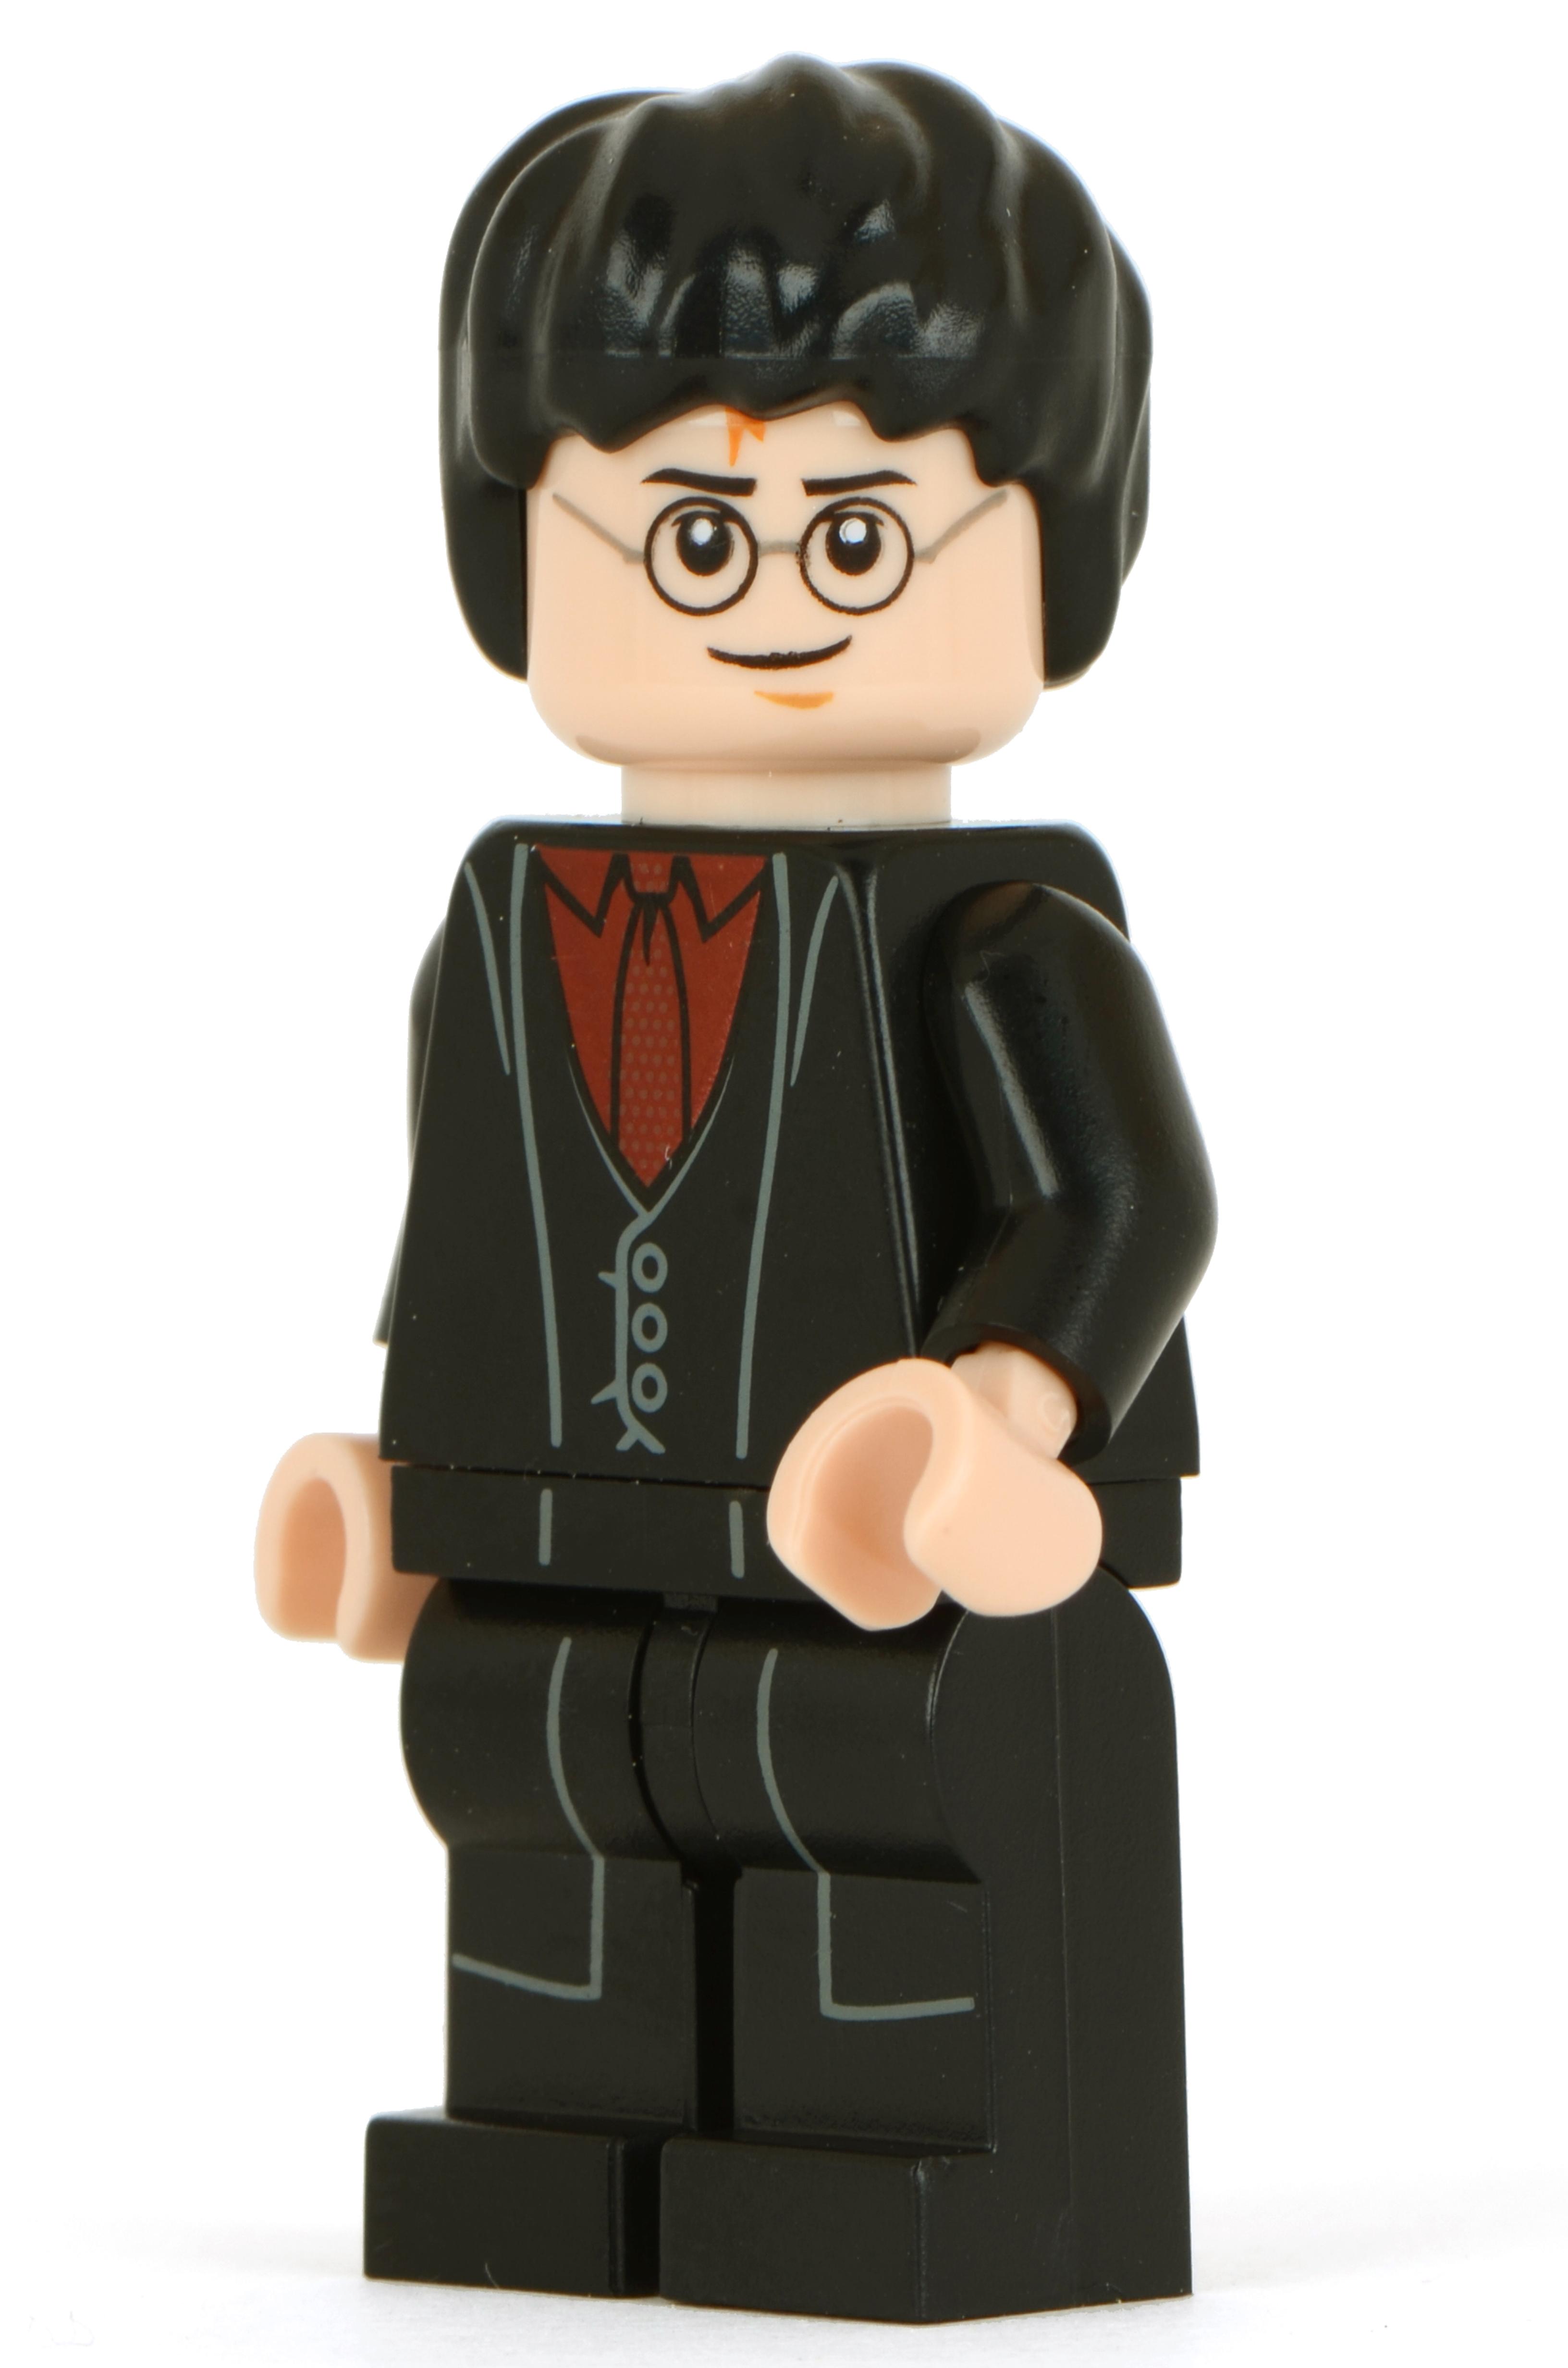 Harry Potter Minifigure Brickipedia The Lego Wiki